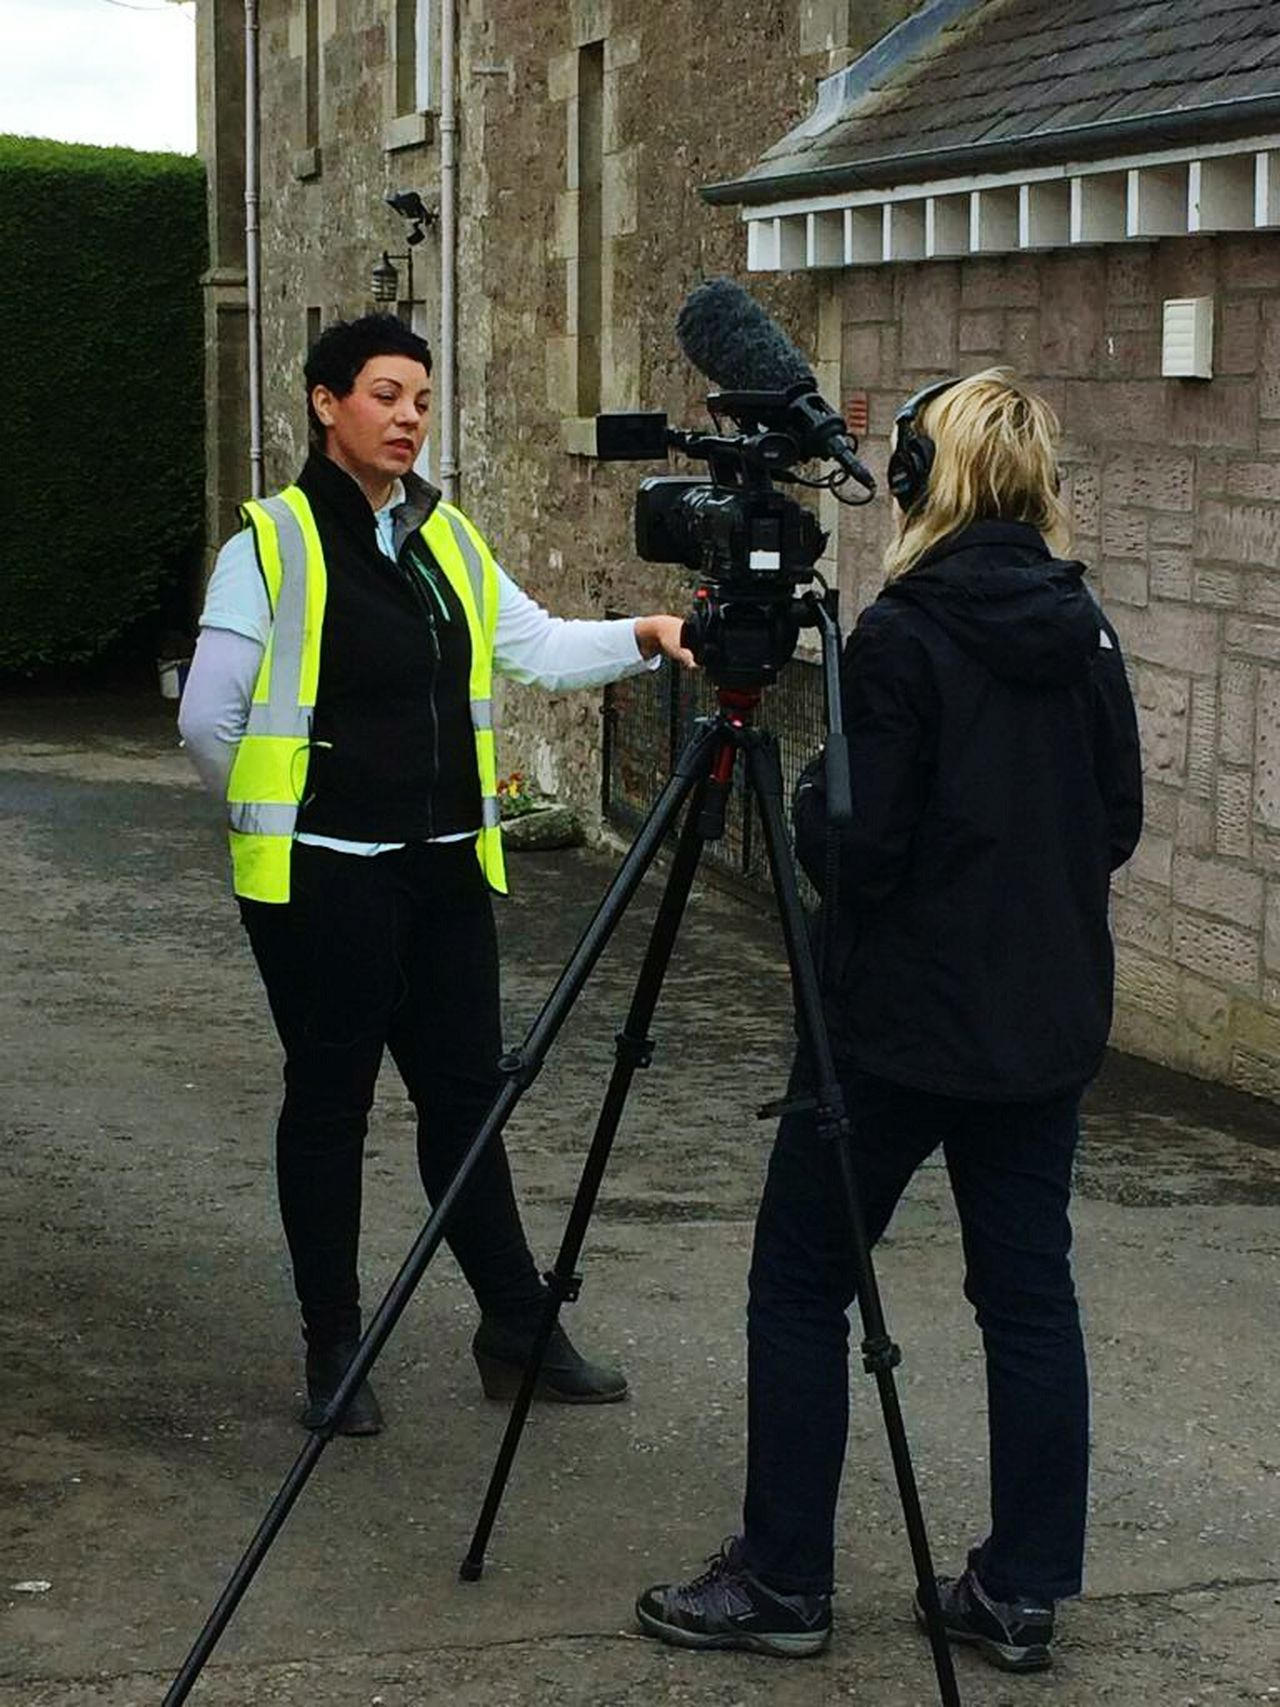 That's Me Grewarfarmvending BBC Medialuvvie Activekids Perthshire